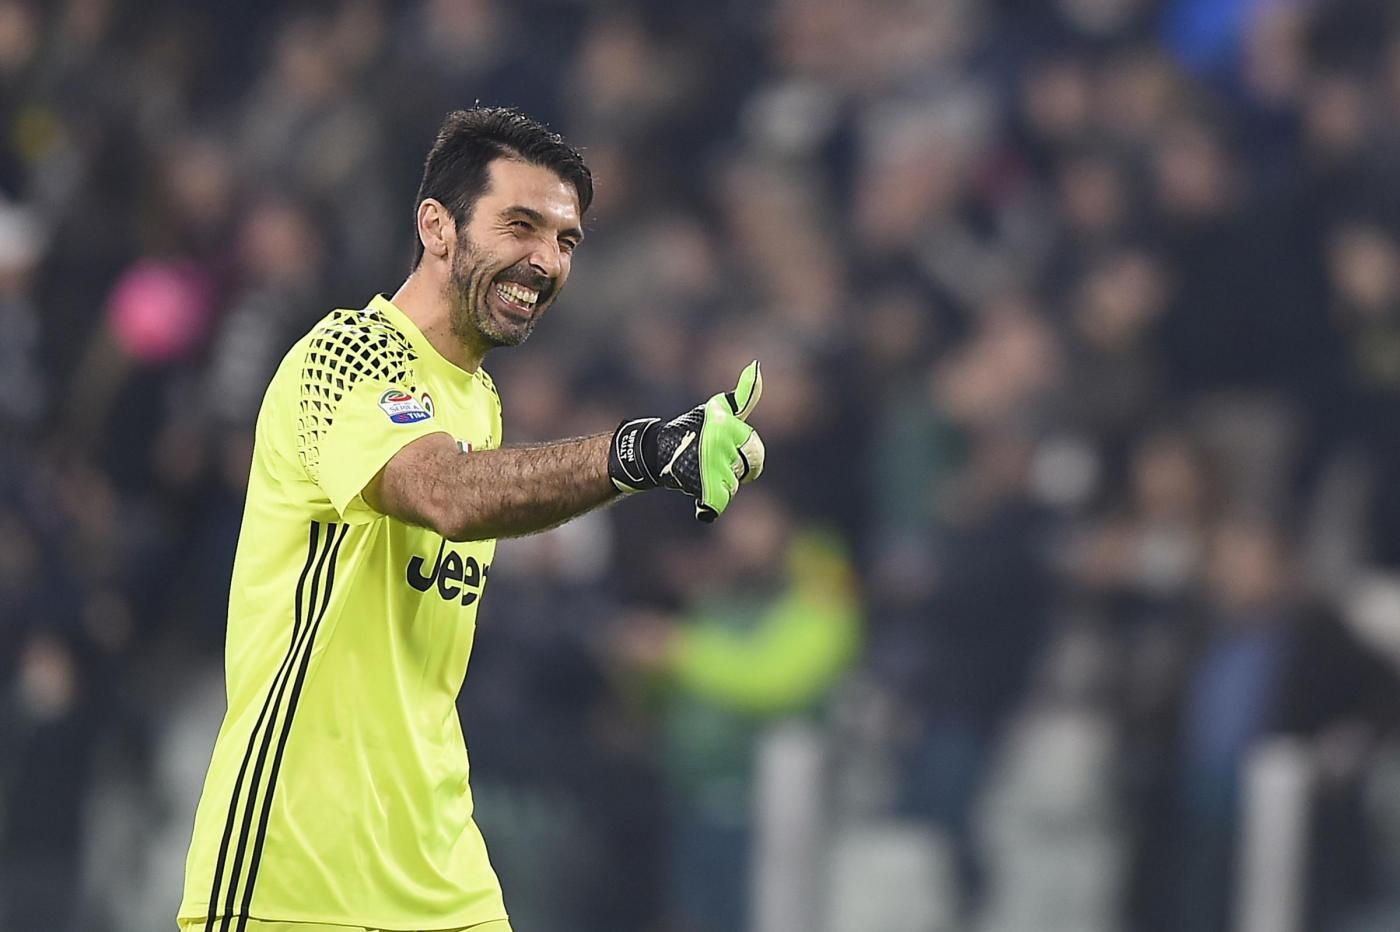 Porto Juventus, la vera partita è tra Gigi Buffon e Iker Casillas